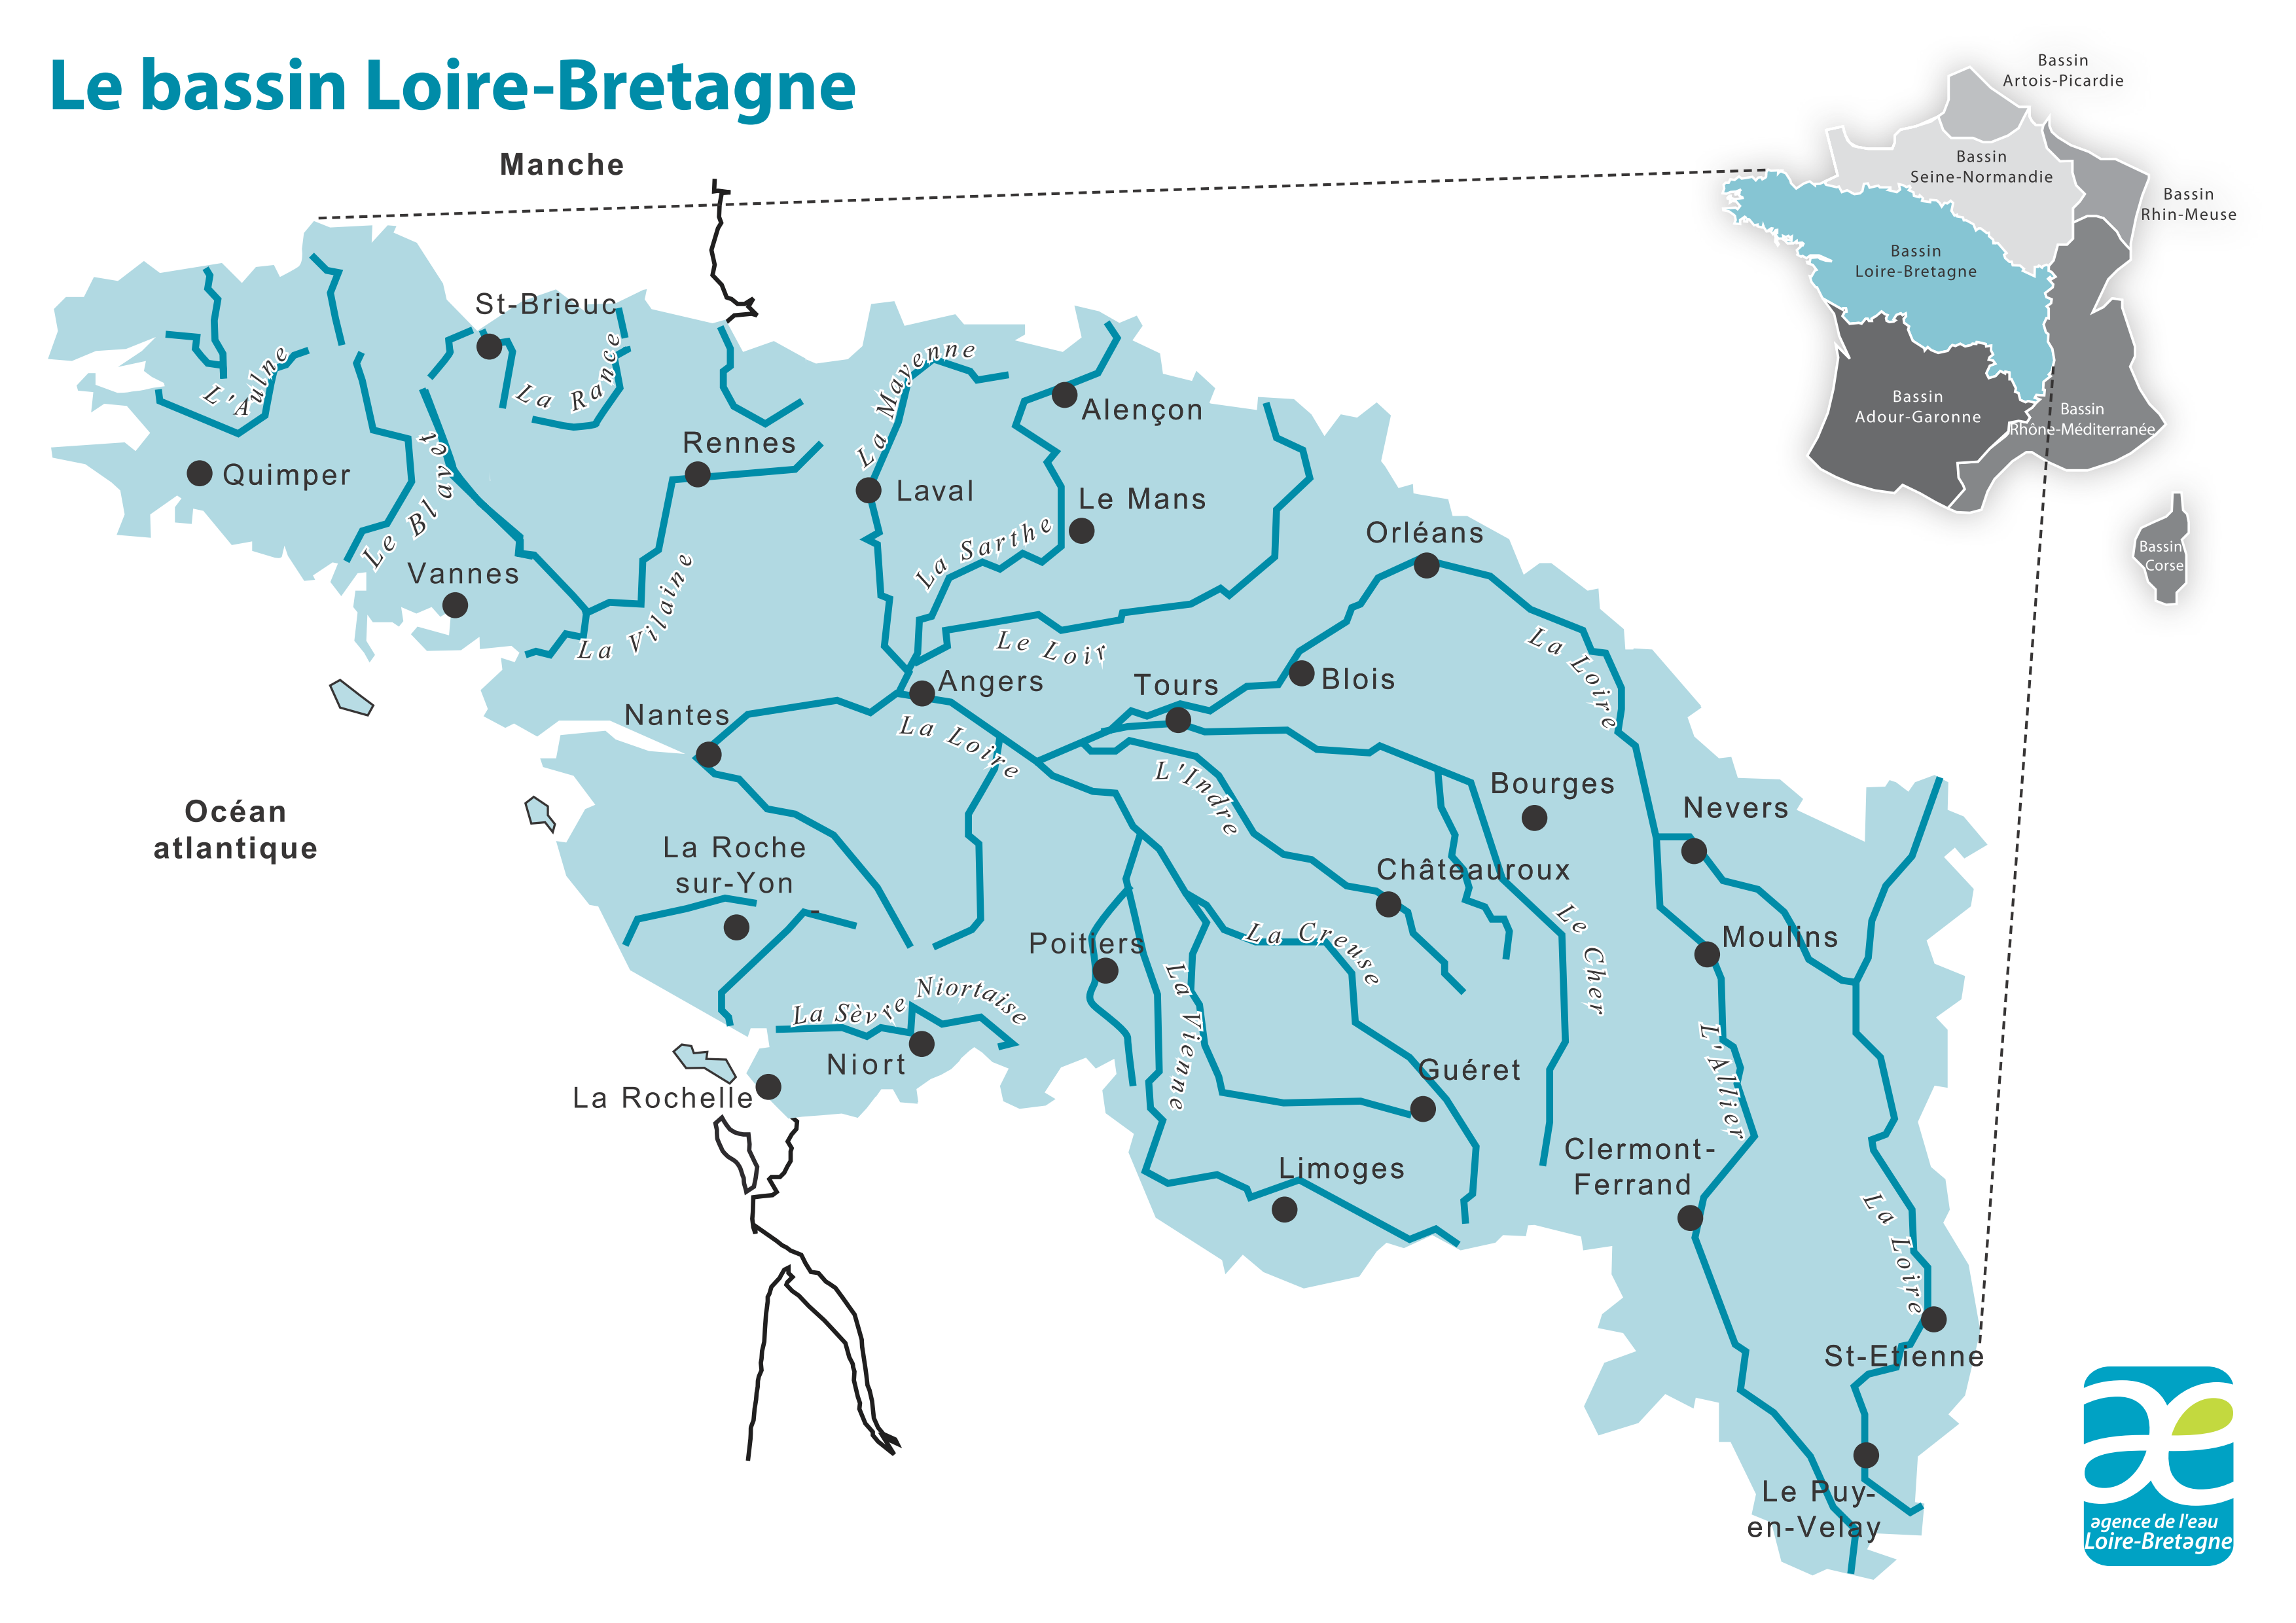 Le bassin Loire-Bretagne